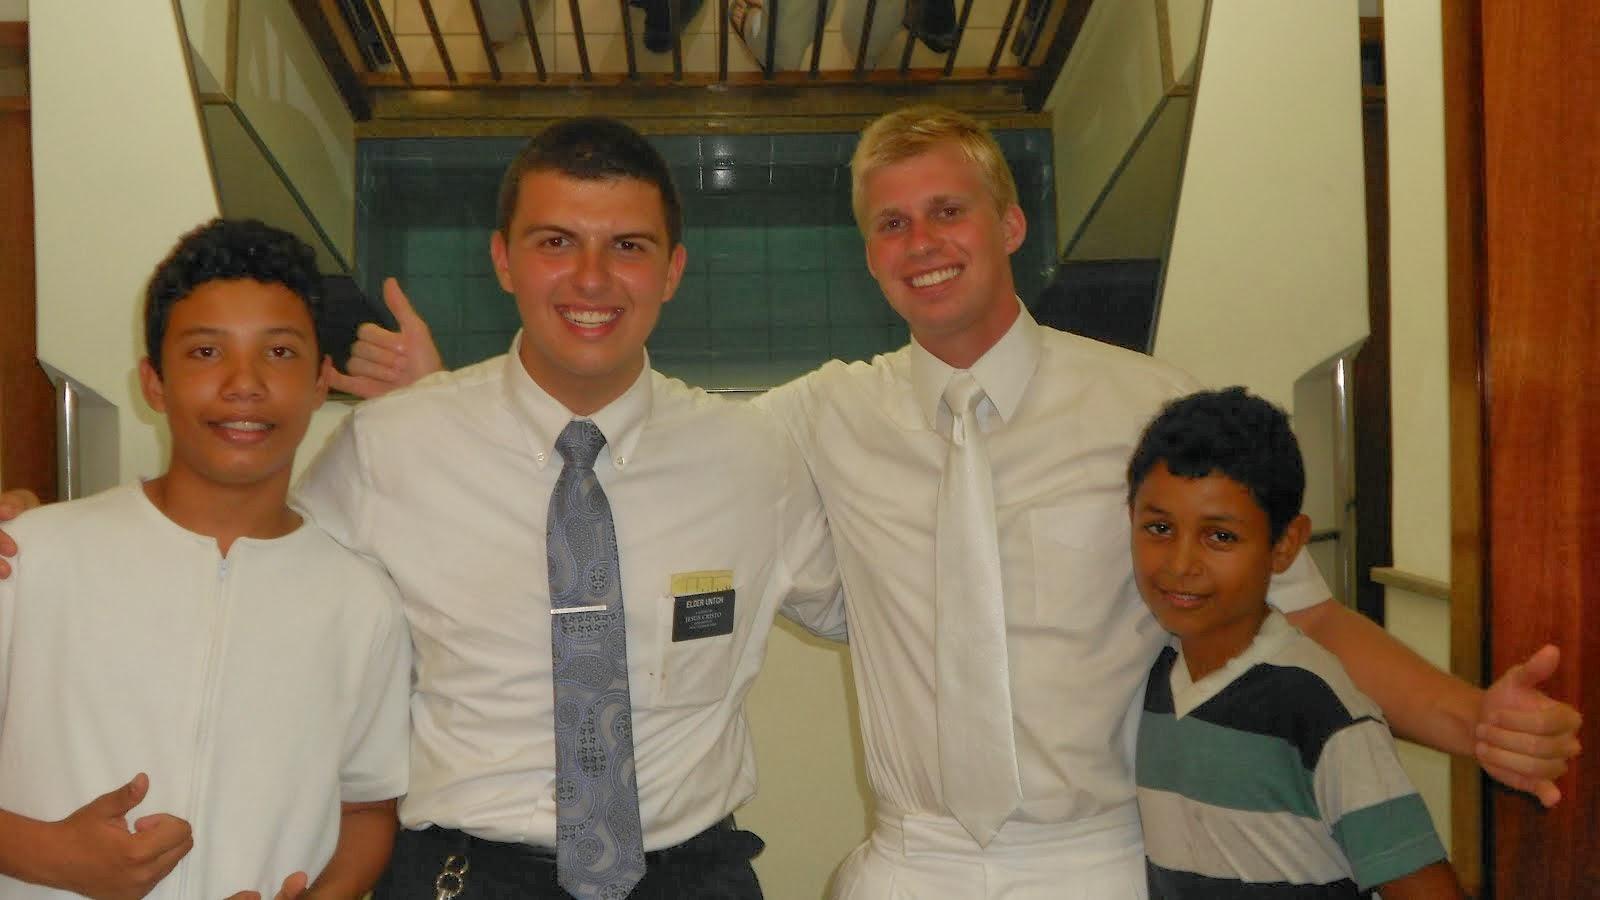 BAPTISM -- Nov. 11, 2013